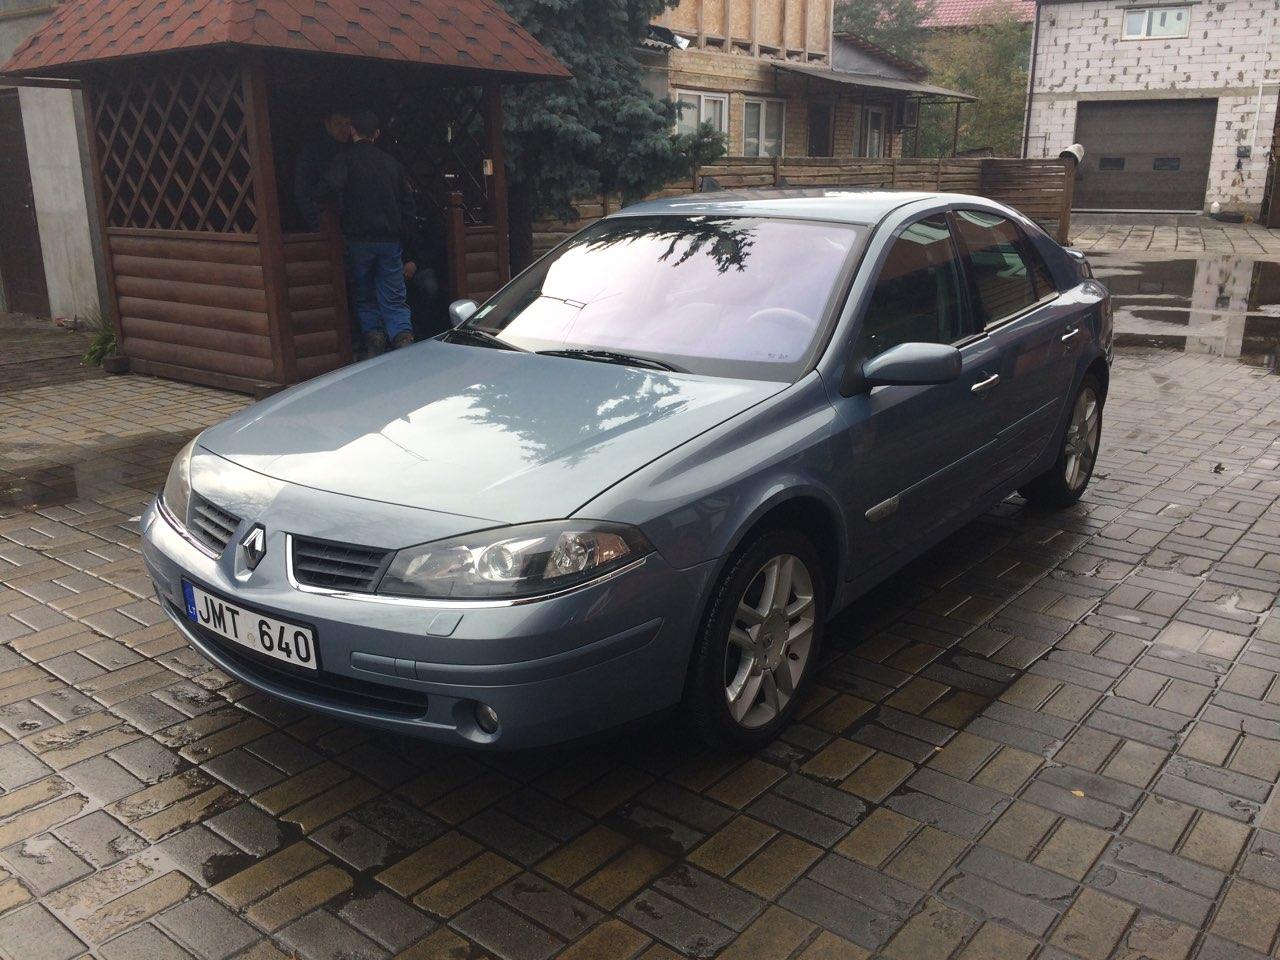 Renault Laguna 1.9 dCi Diesel